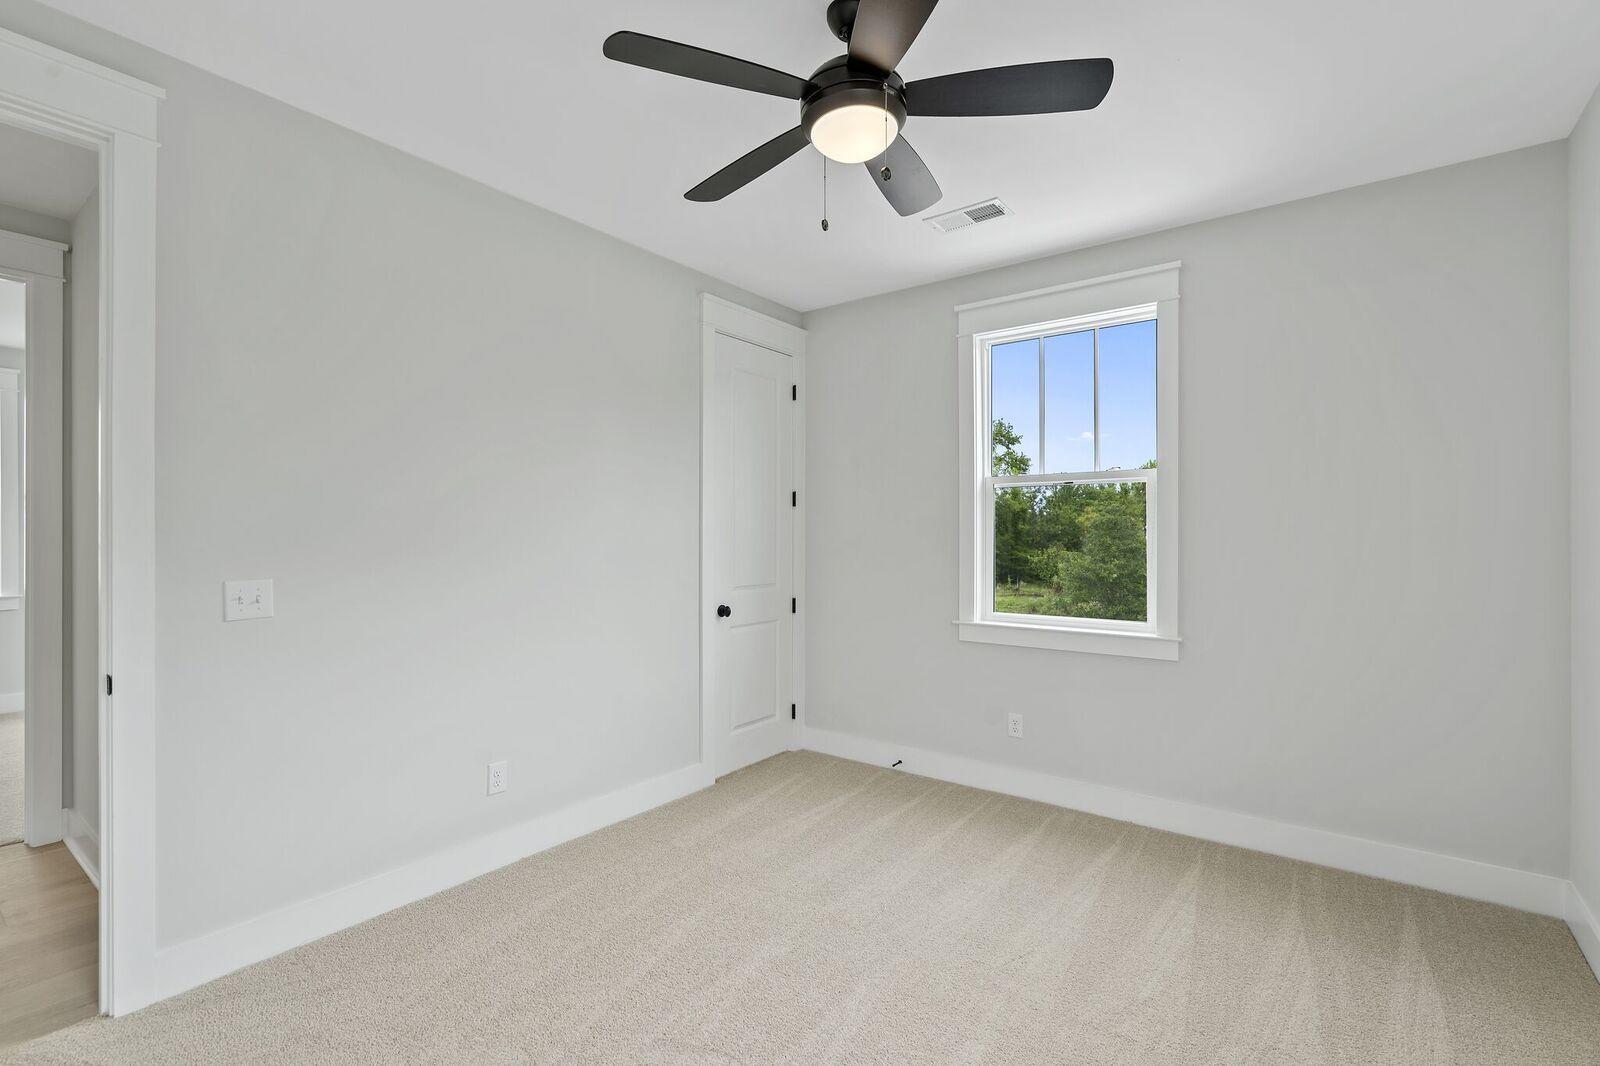 Midtown Homes For Sale - 1533 Kepley, Mount Pleasant, SC - 48